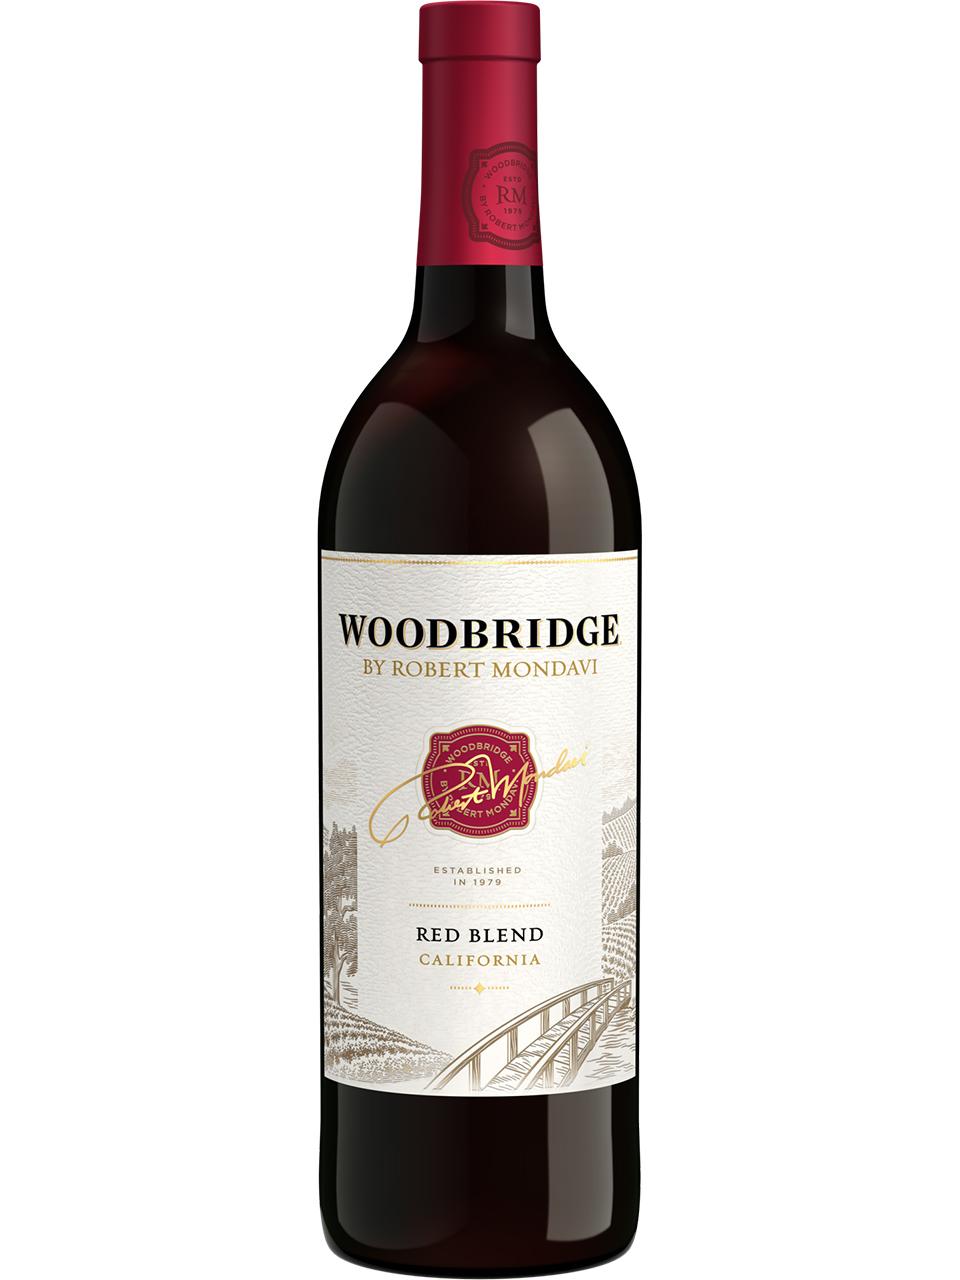 Woodbridge Robert Mondavi Red Blend